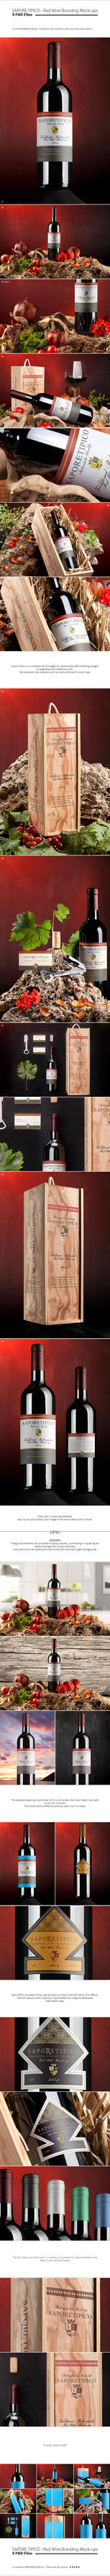 Sapore Tipico - Red Wine Branding Mock-ups by NuwanP